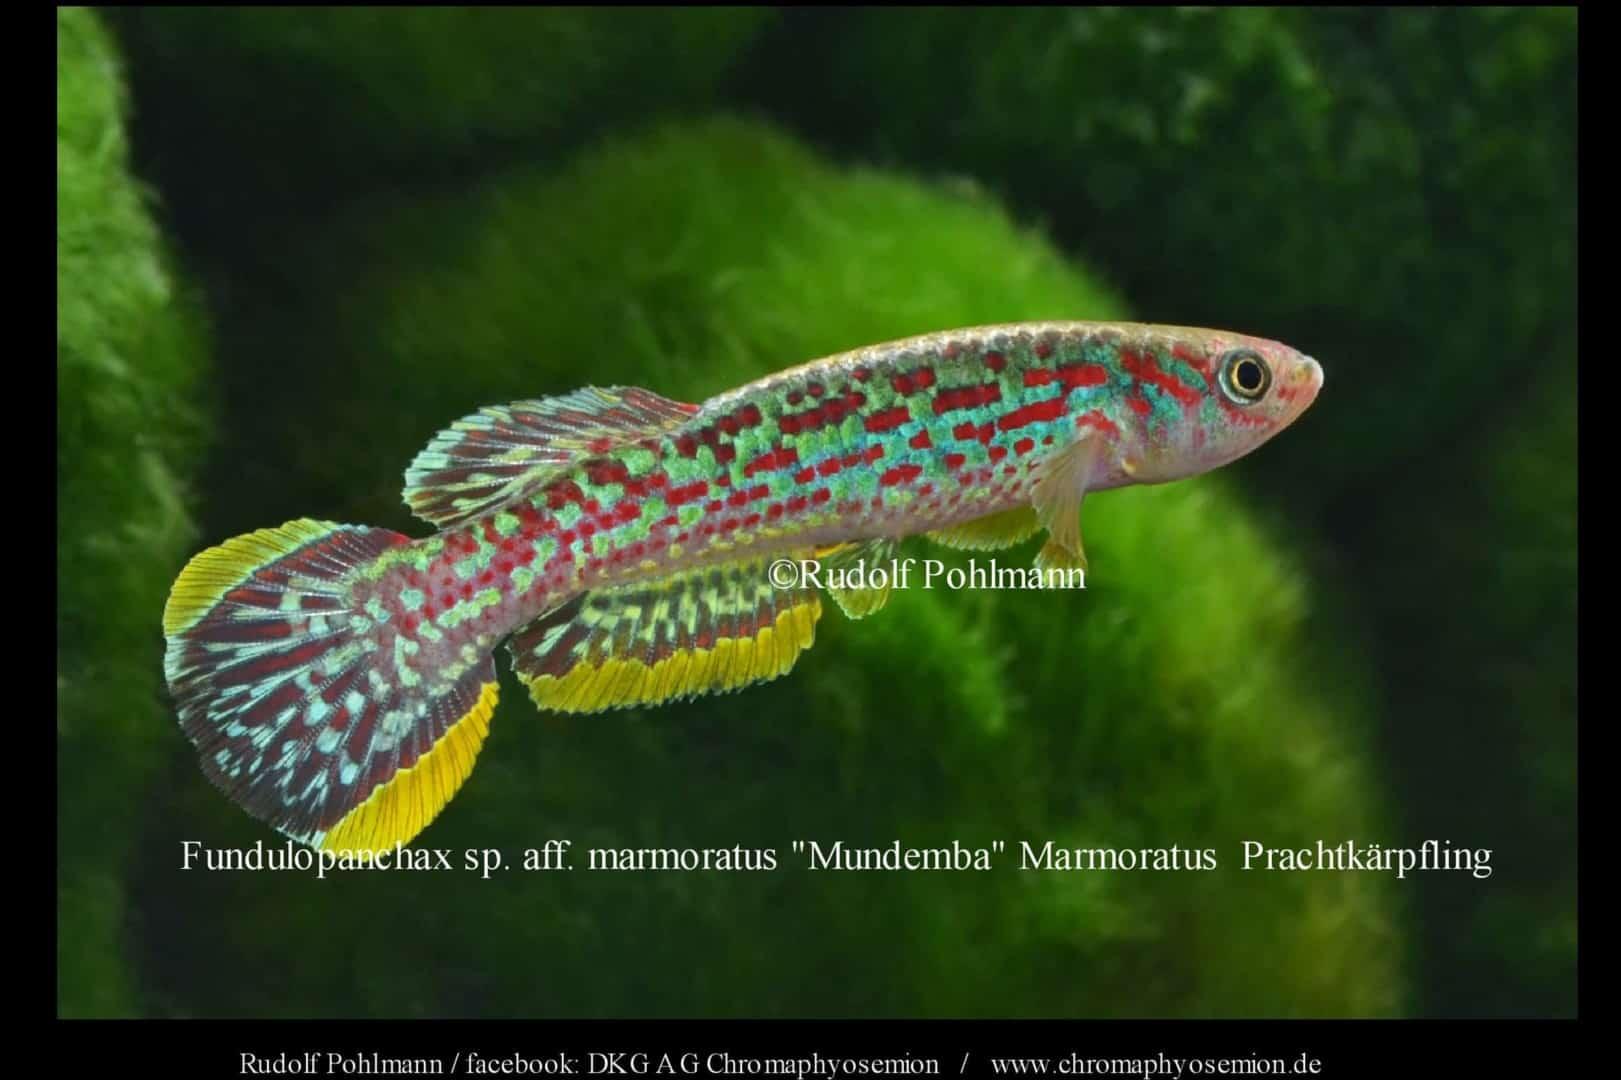 Fundulopanchax marmoratus – Marmoratus Prachtkärpfling 5